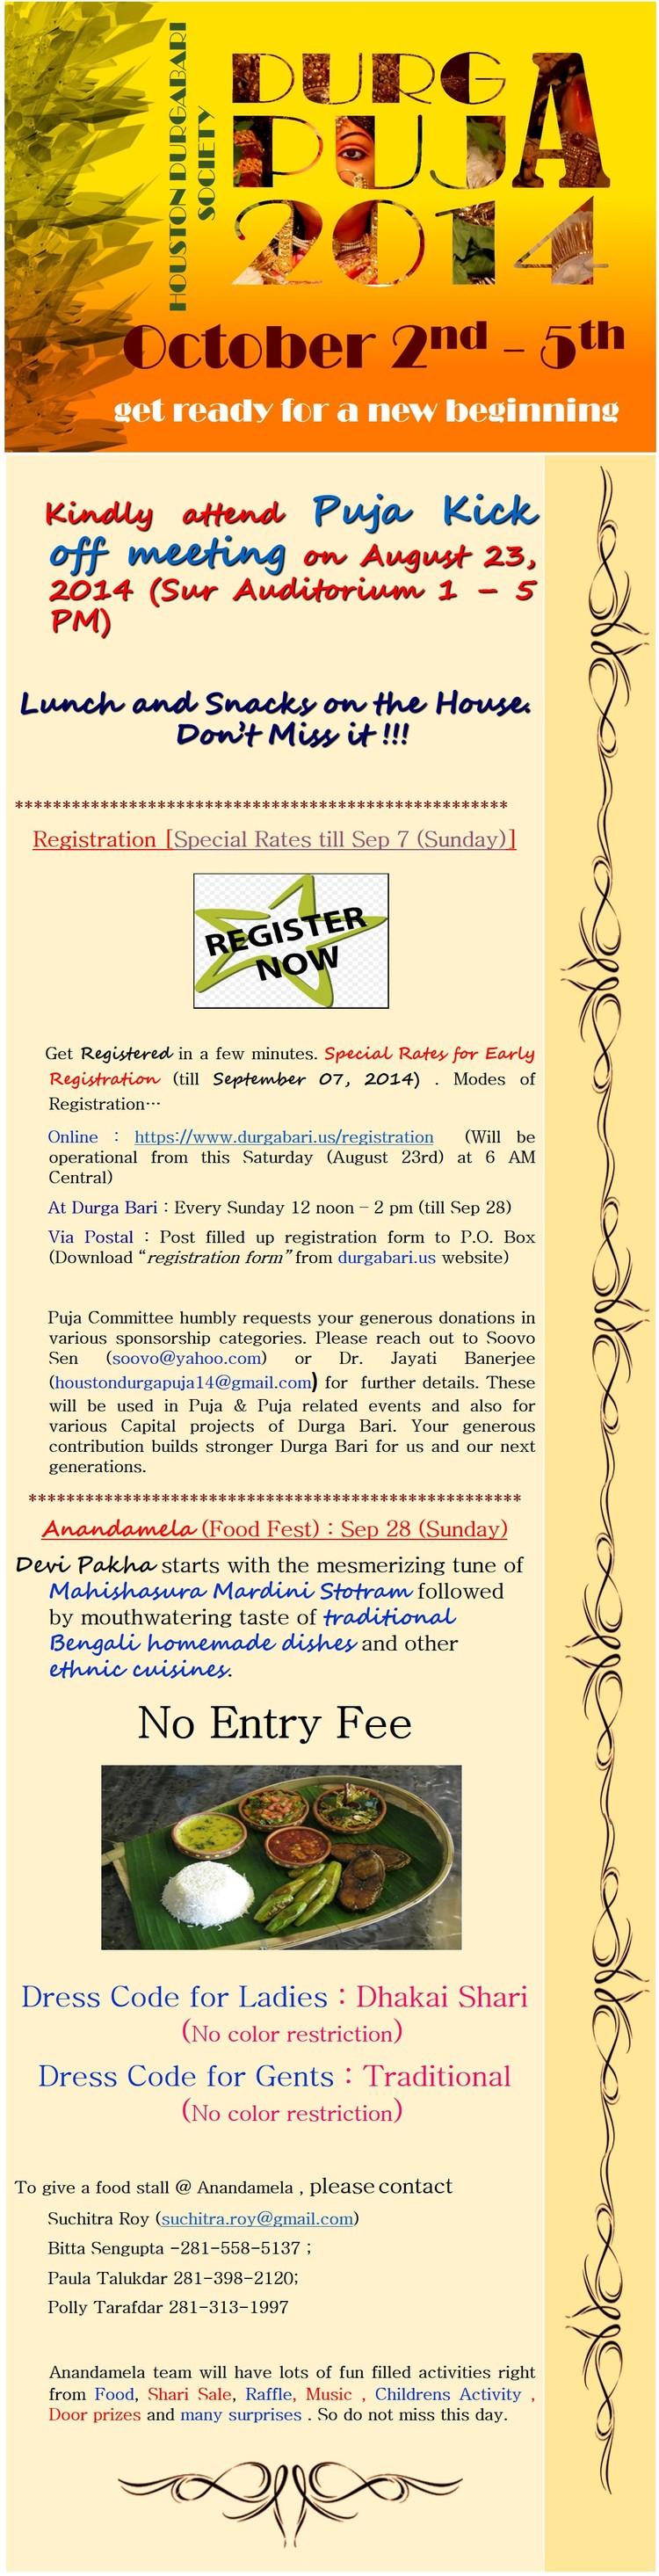 Puja E-News August 21 4